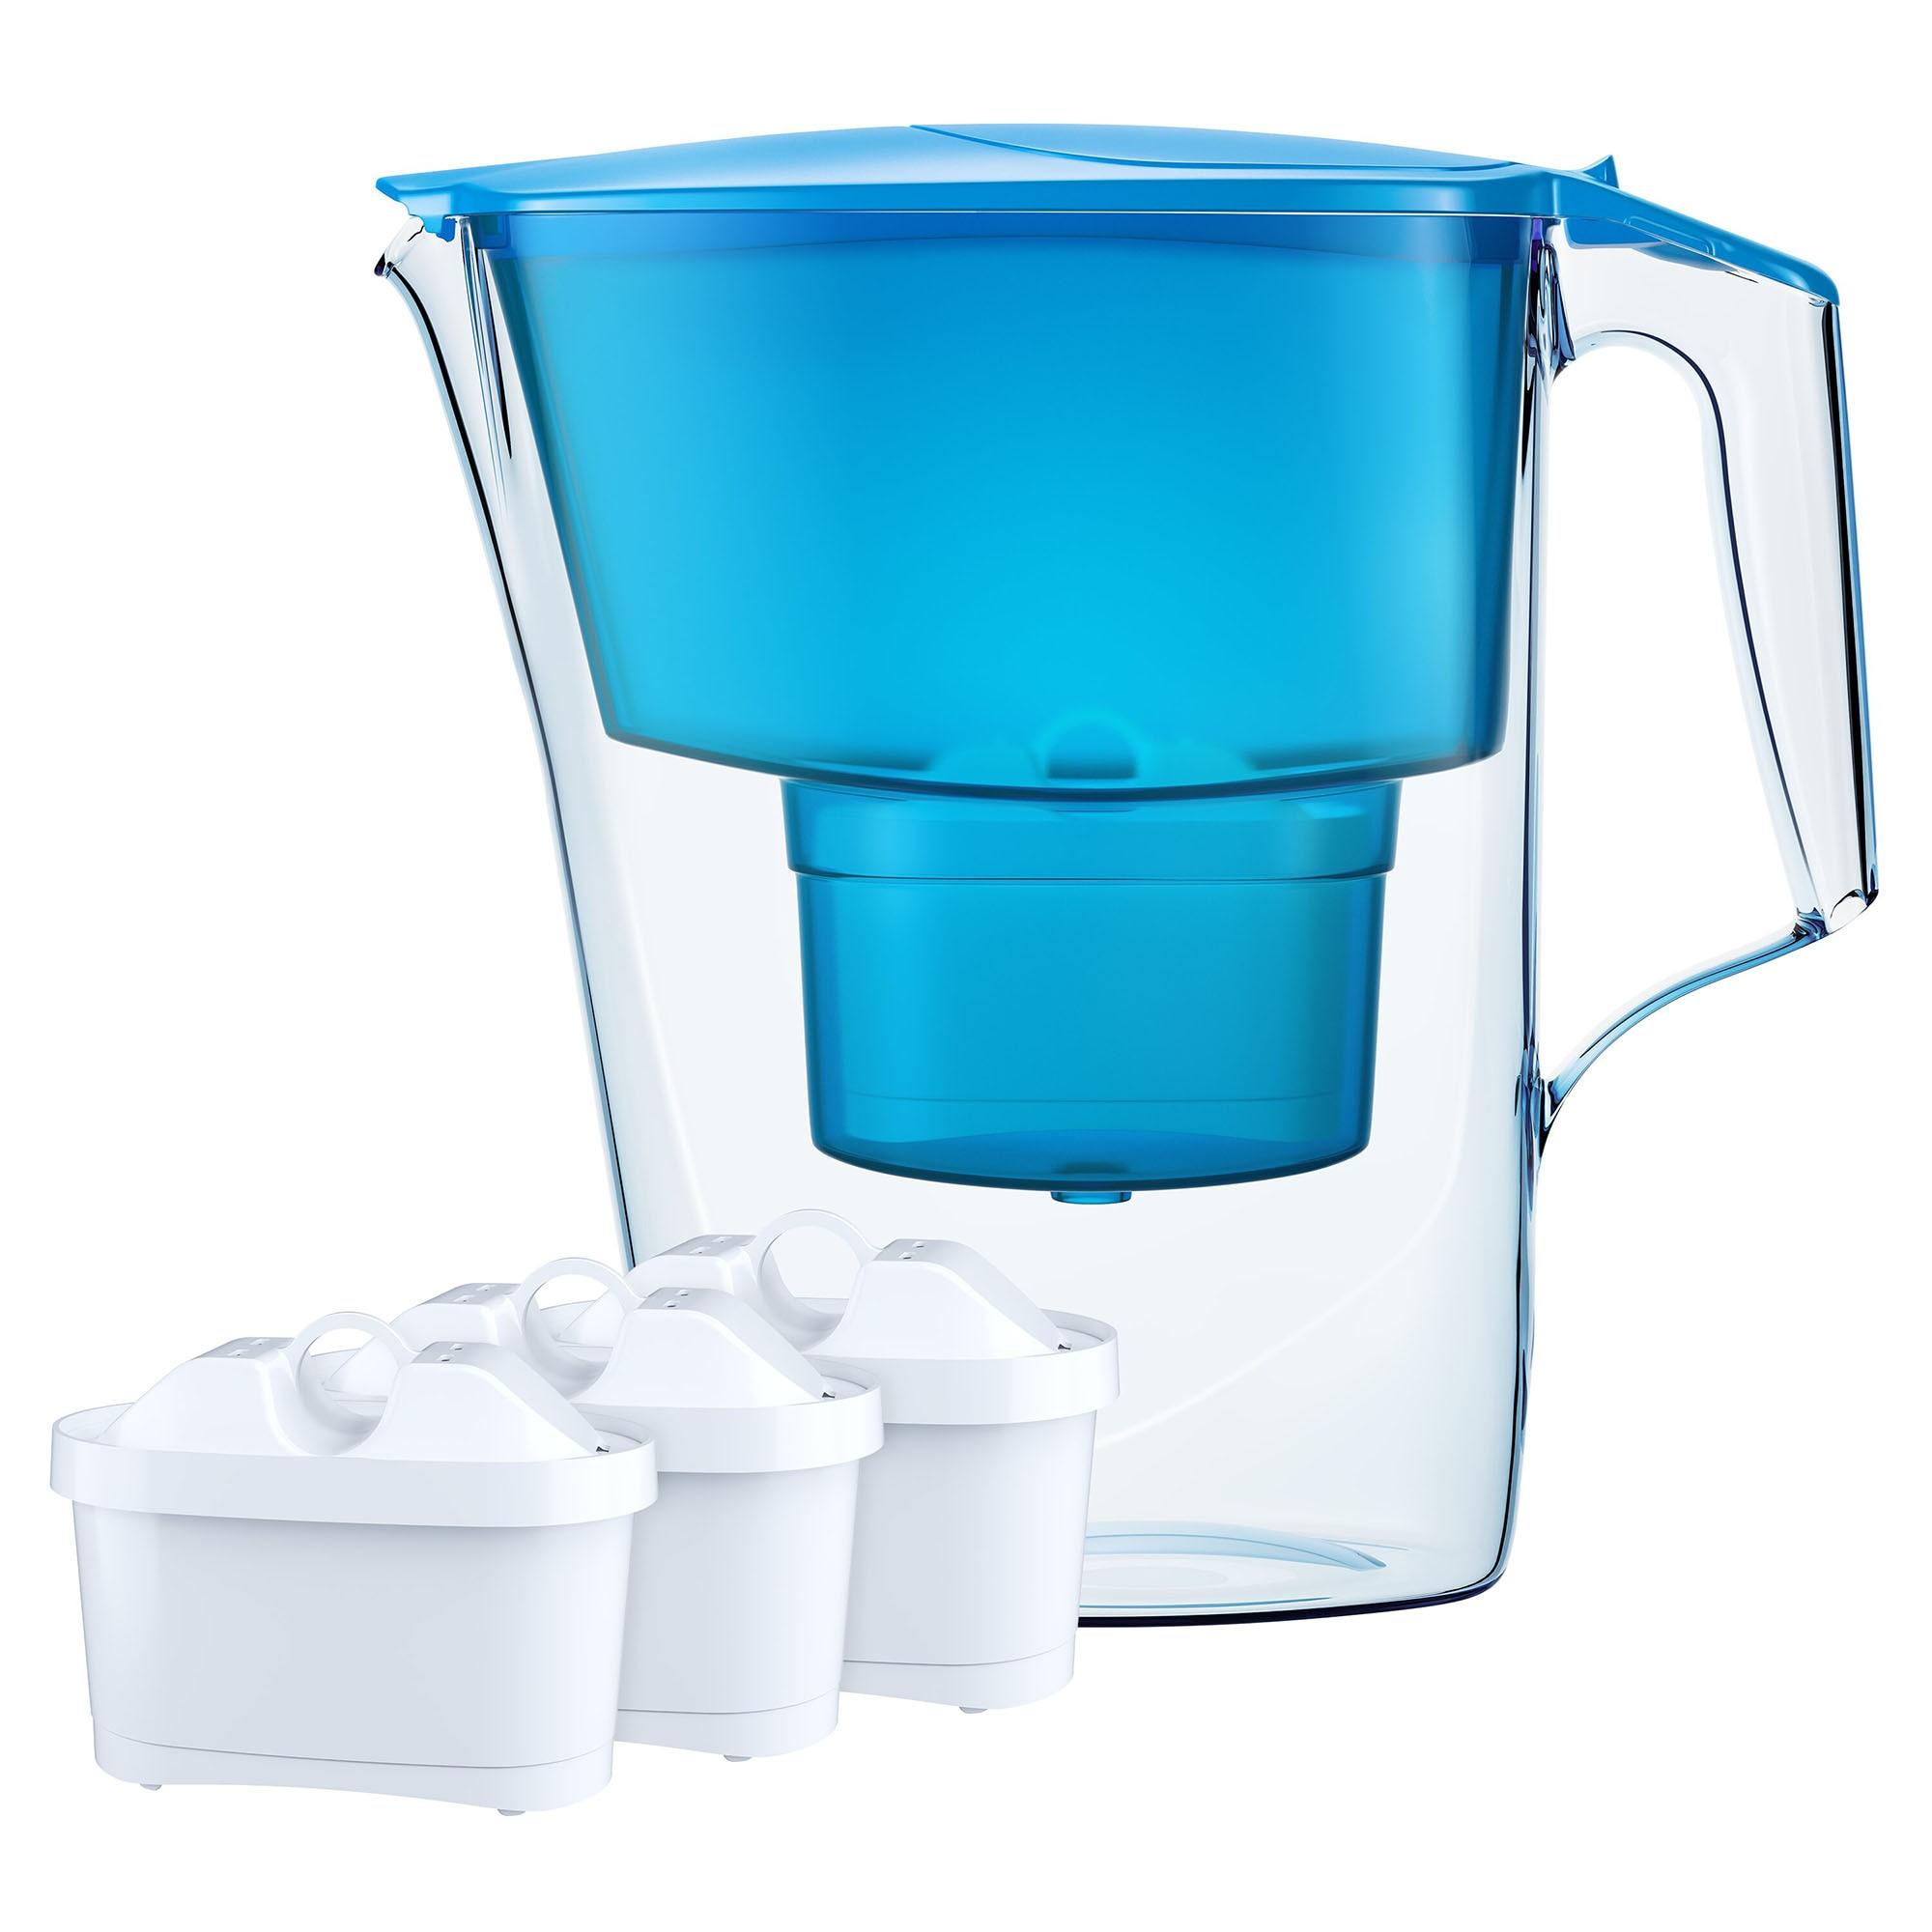 Cana filtranta cu 3 cartuse Maxfor Aquaphor, model Time Blue